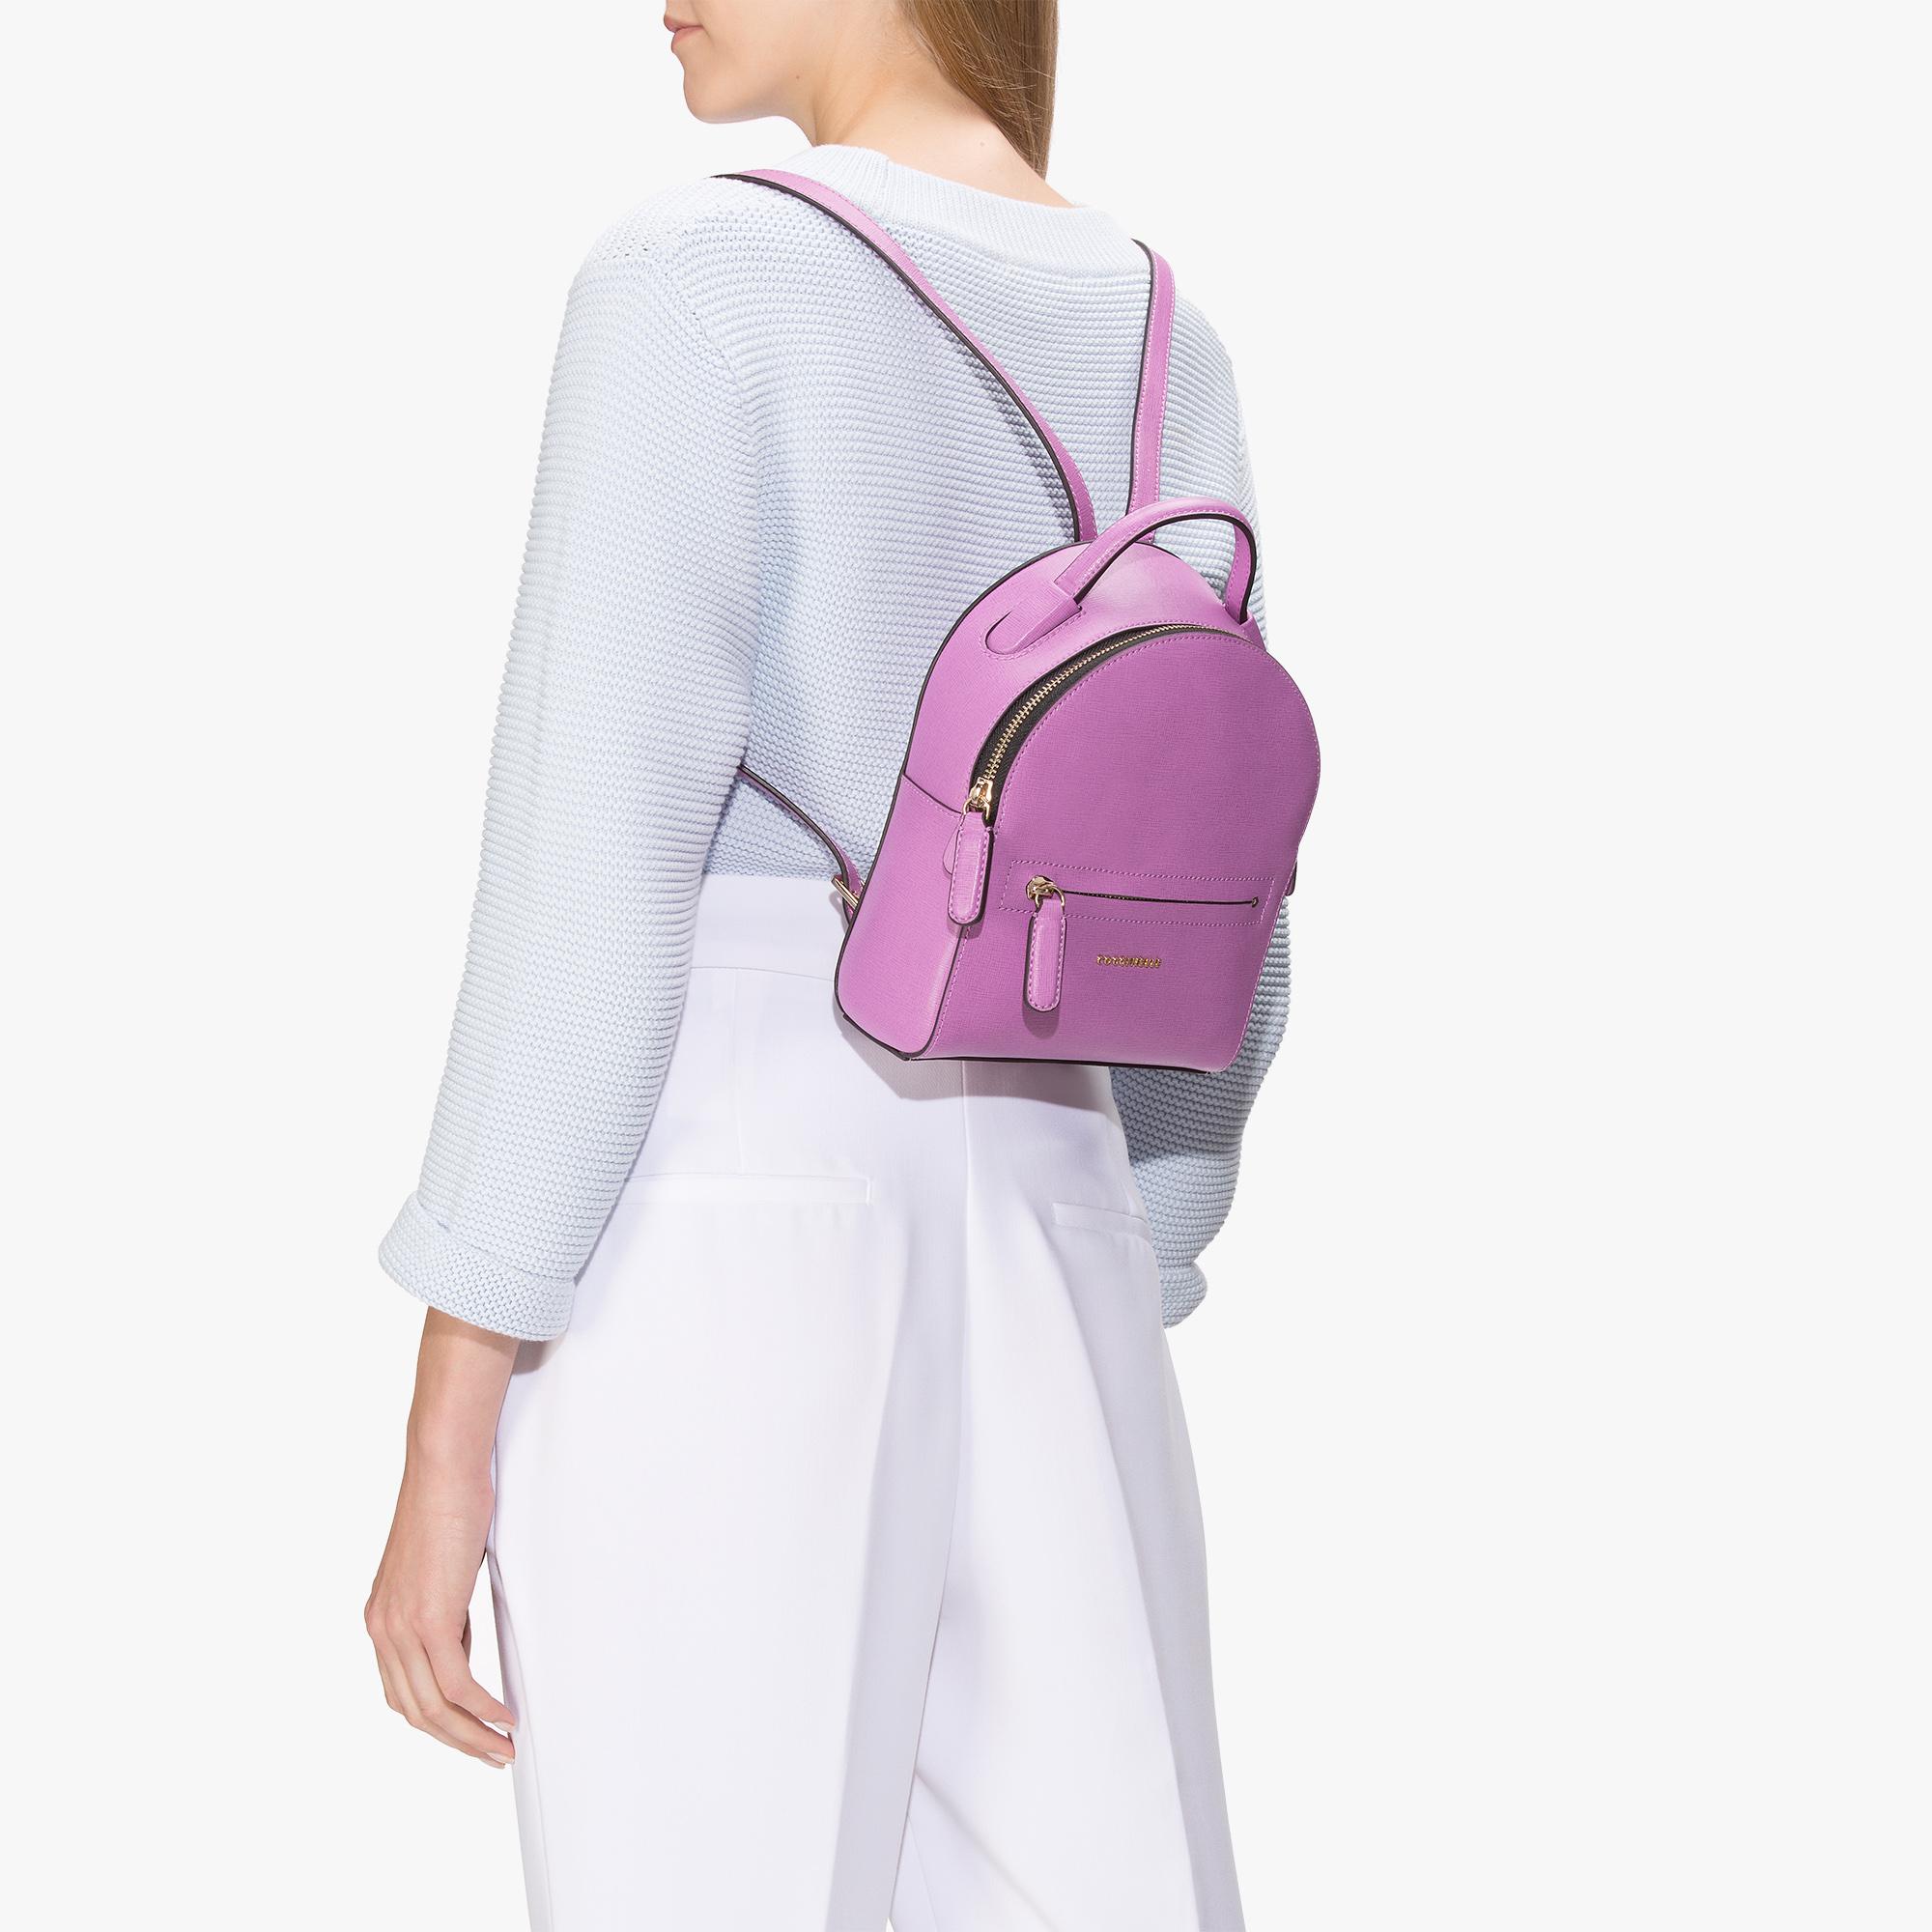 Clementine saffiano mini backpack